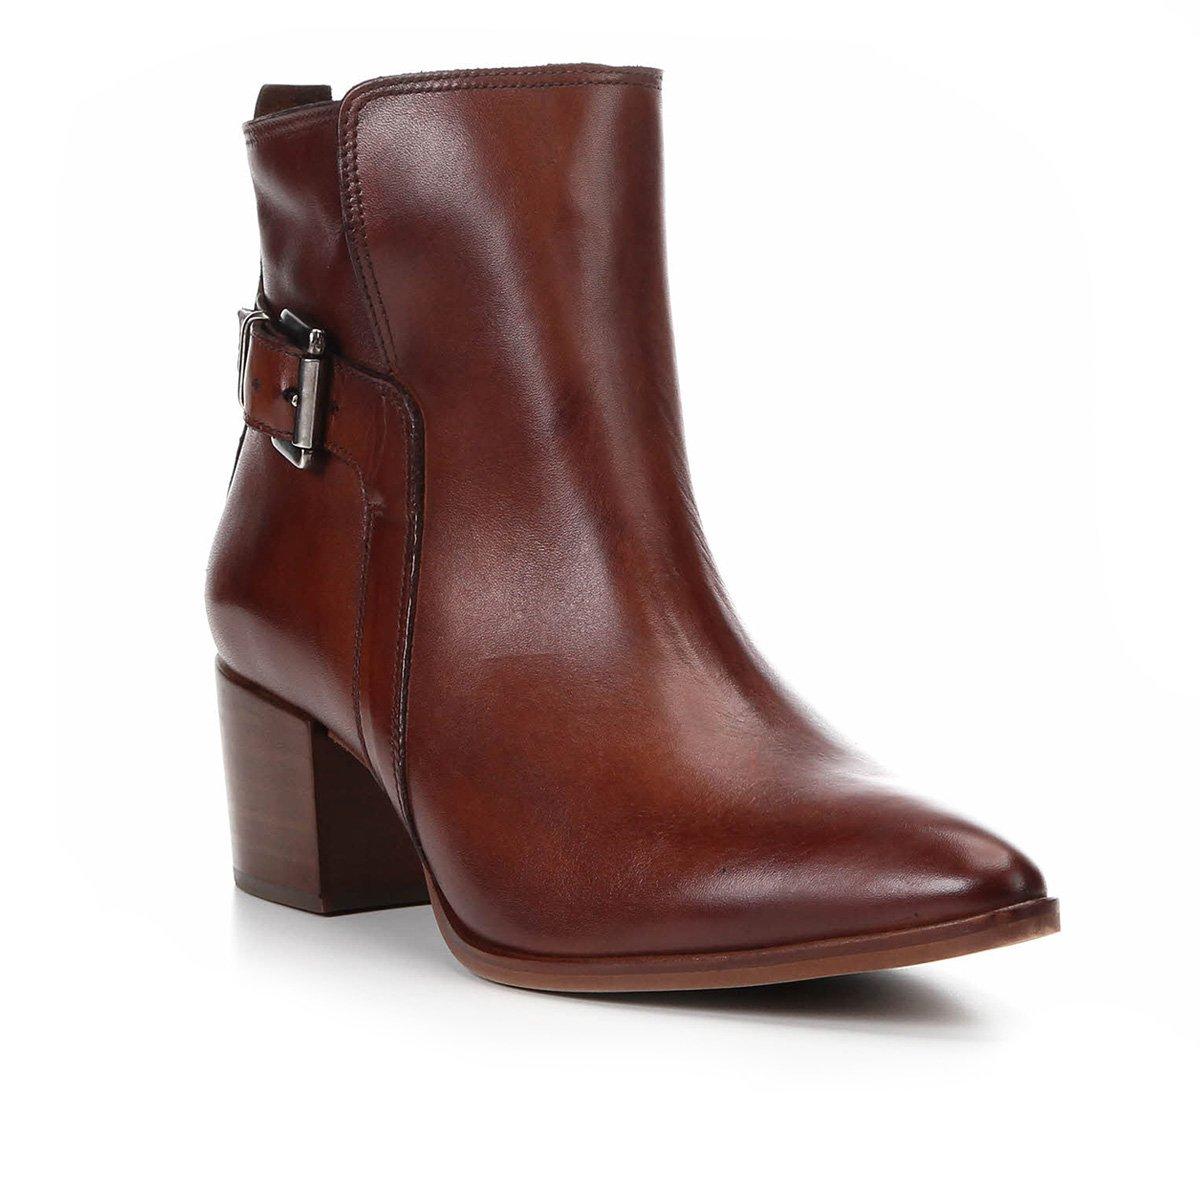 0221ff16b2 Bota Couro Cano Curto Shoestock Bico Fino Fivela Feminina - Marrom ...